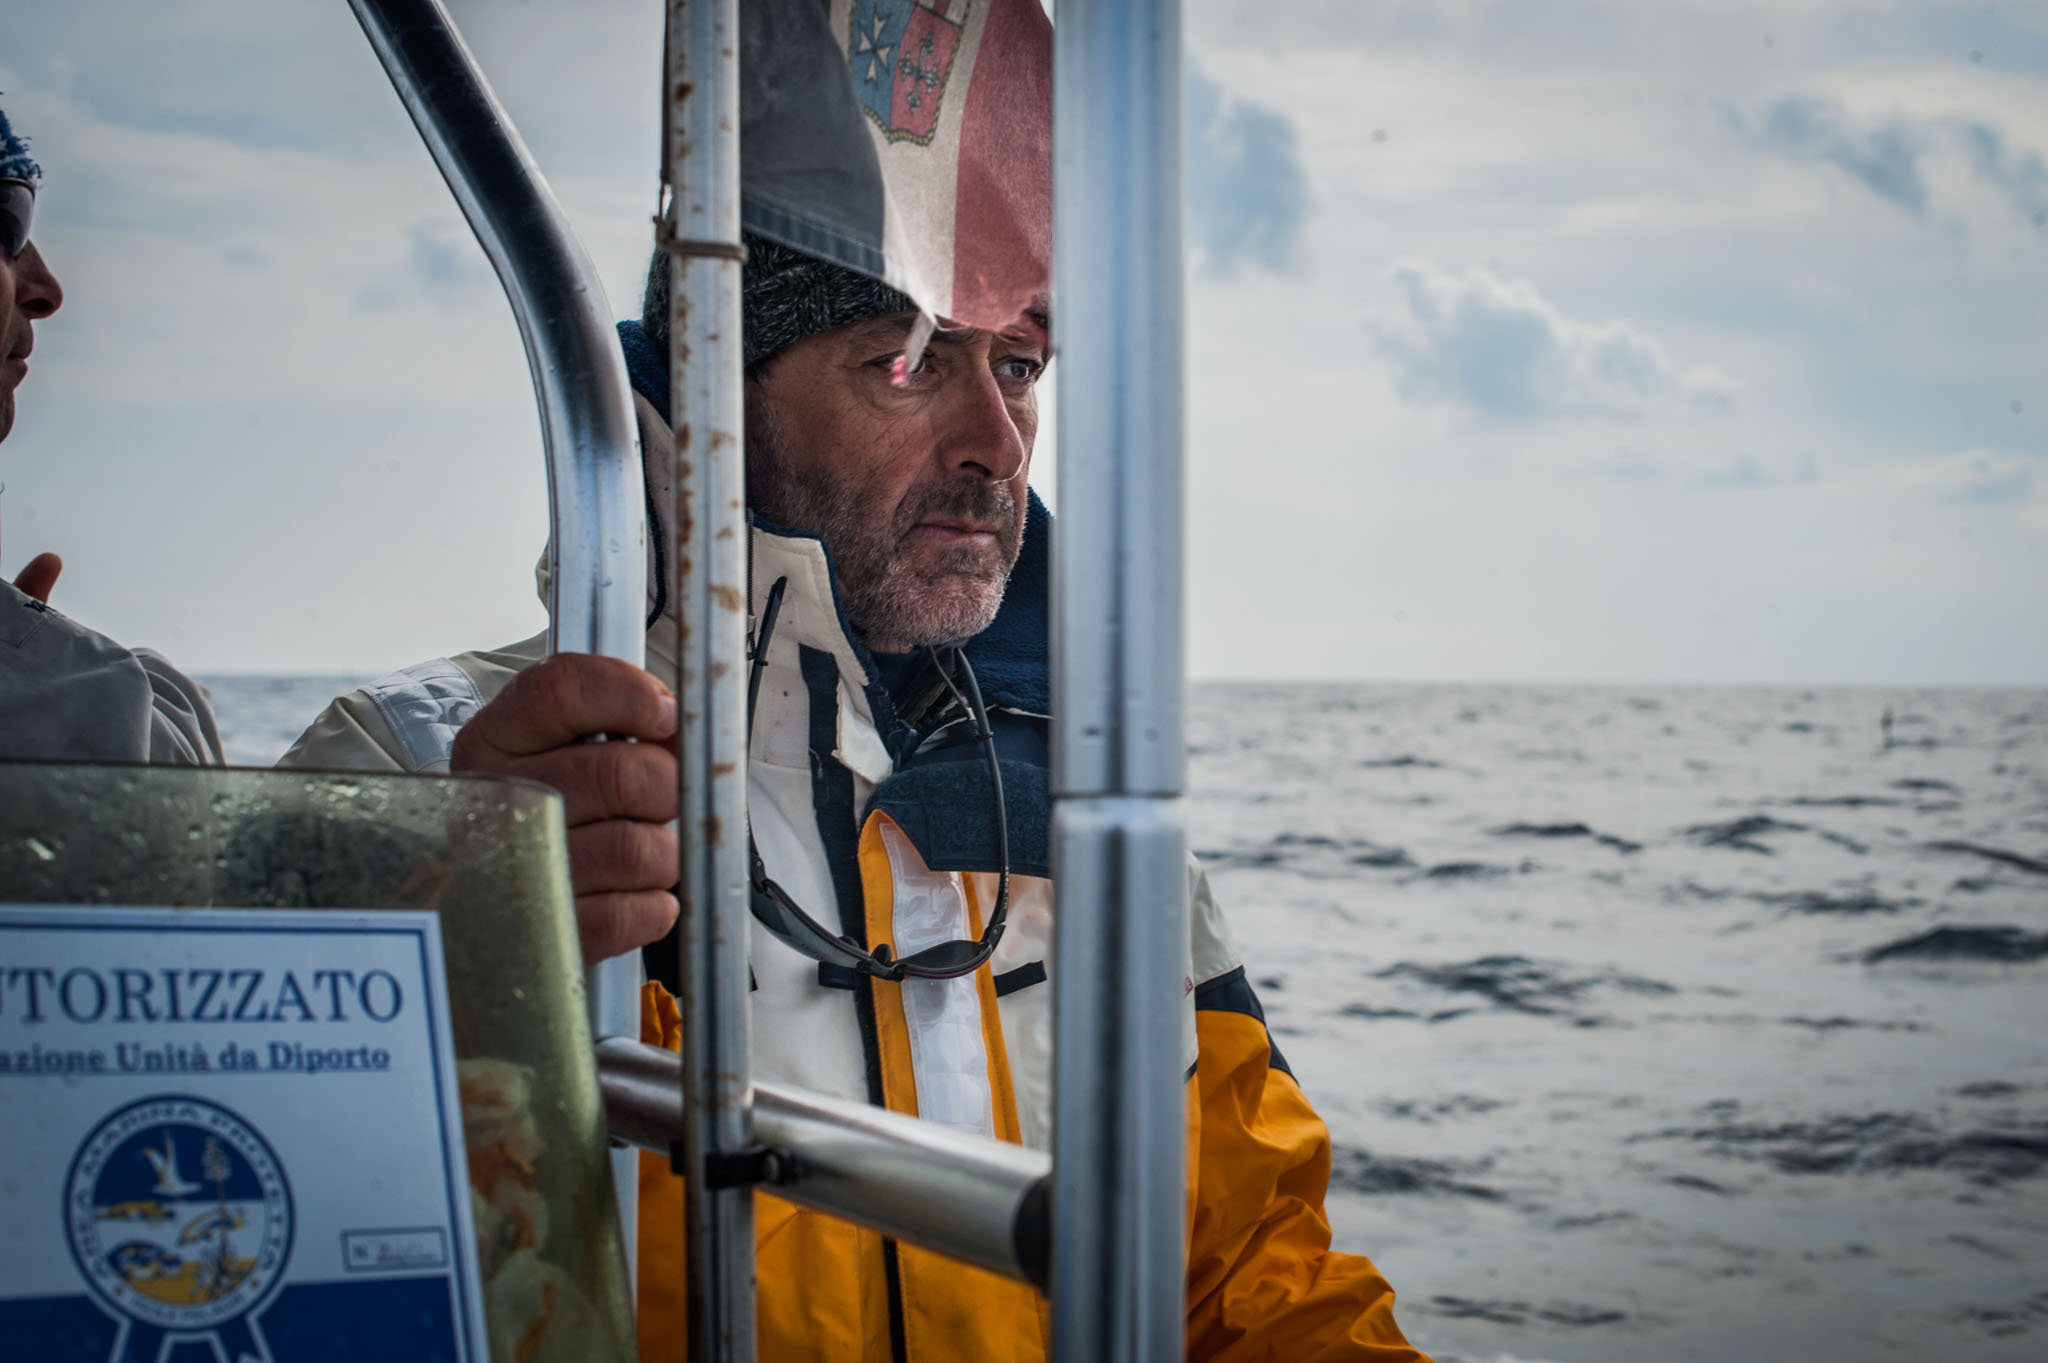 Giancarlo Lauriano (ISPRA Researcher).(Lampedusa, 2017)